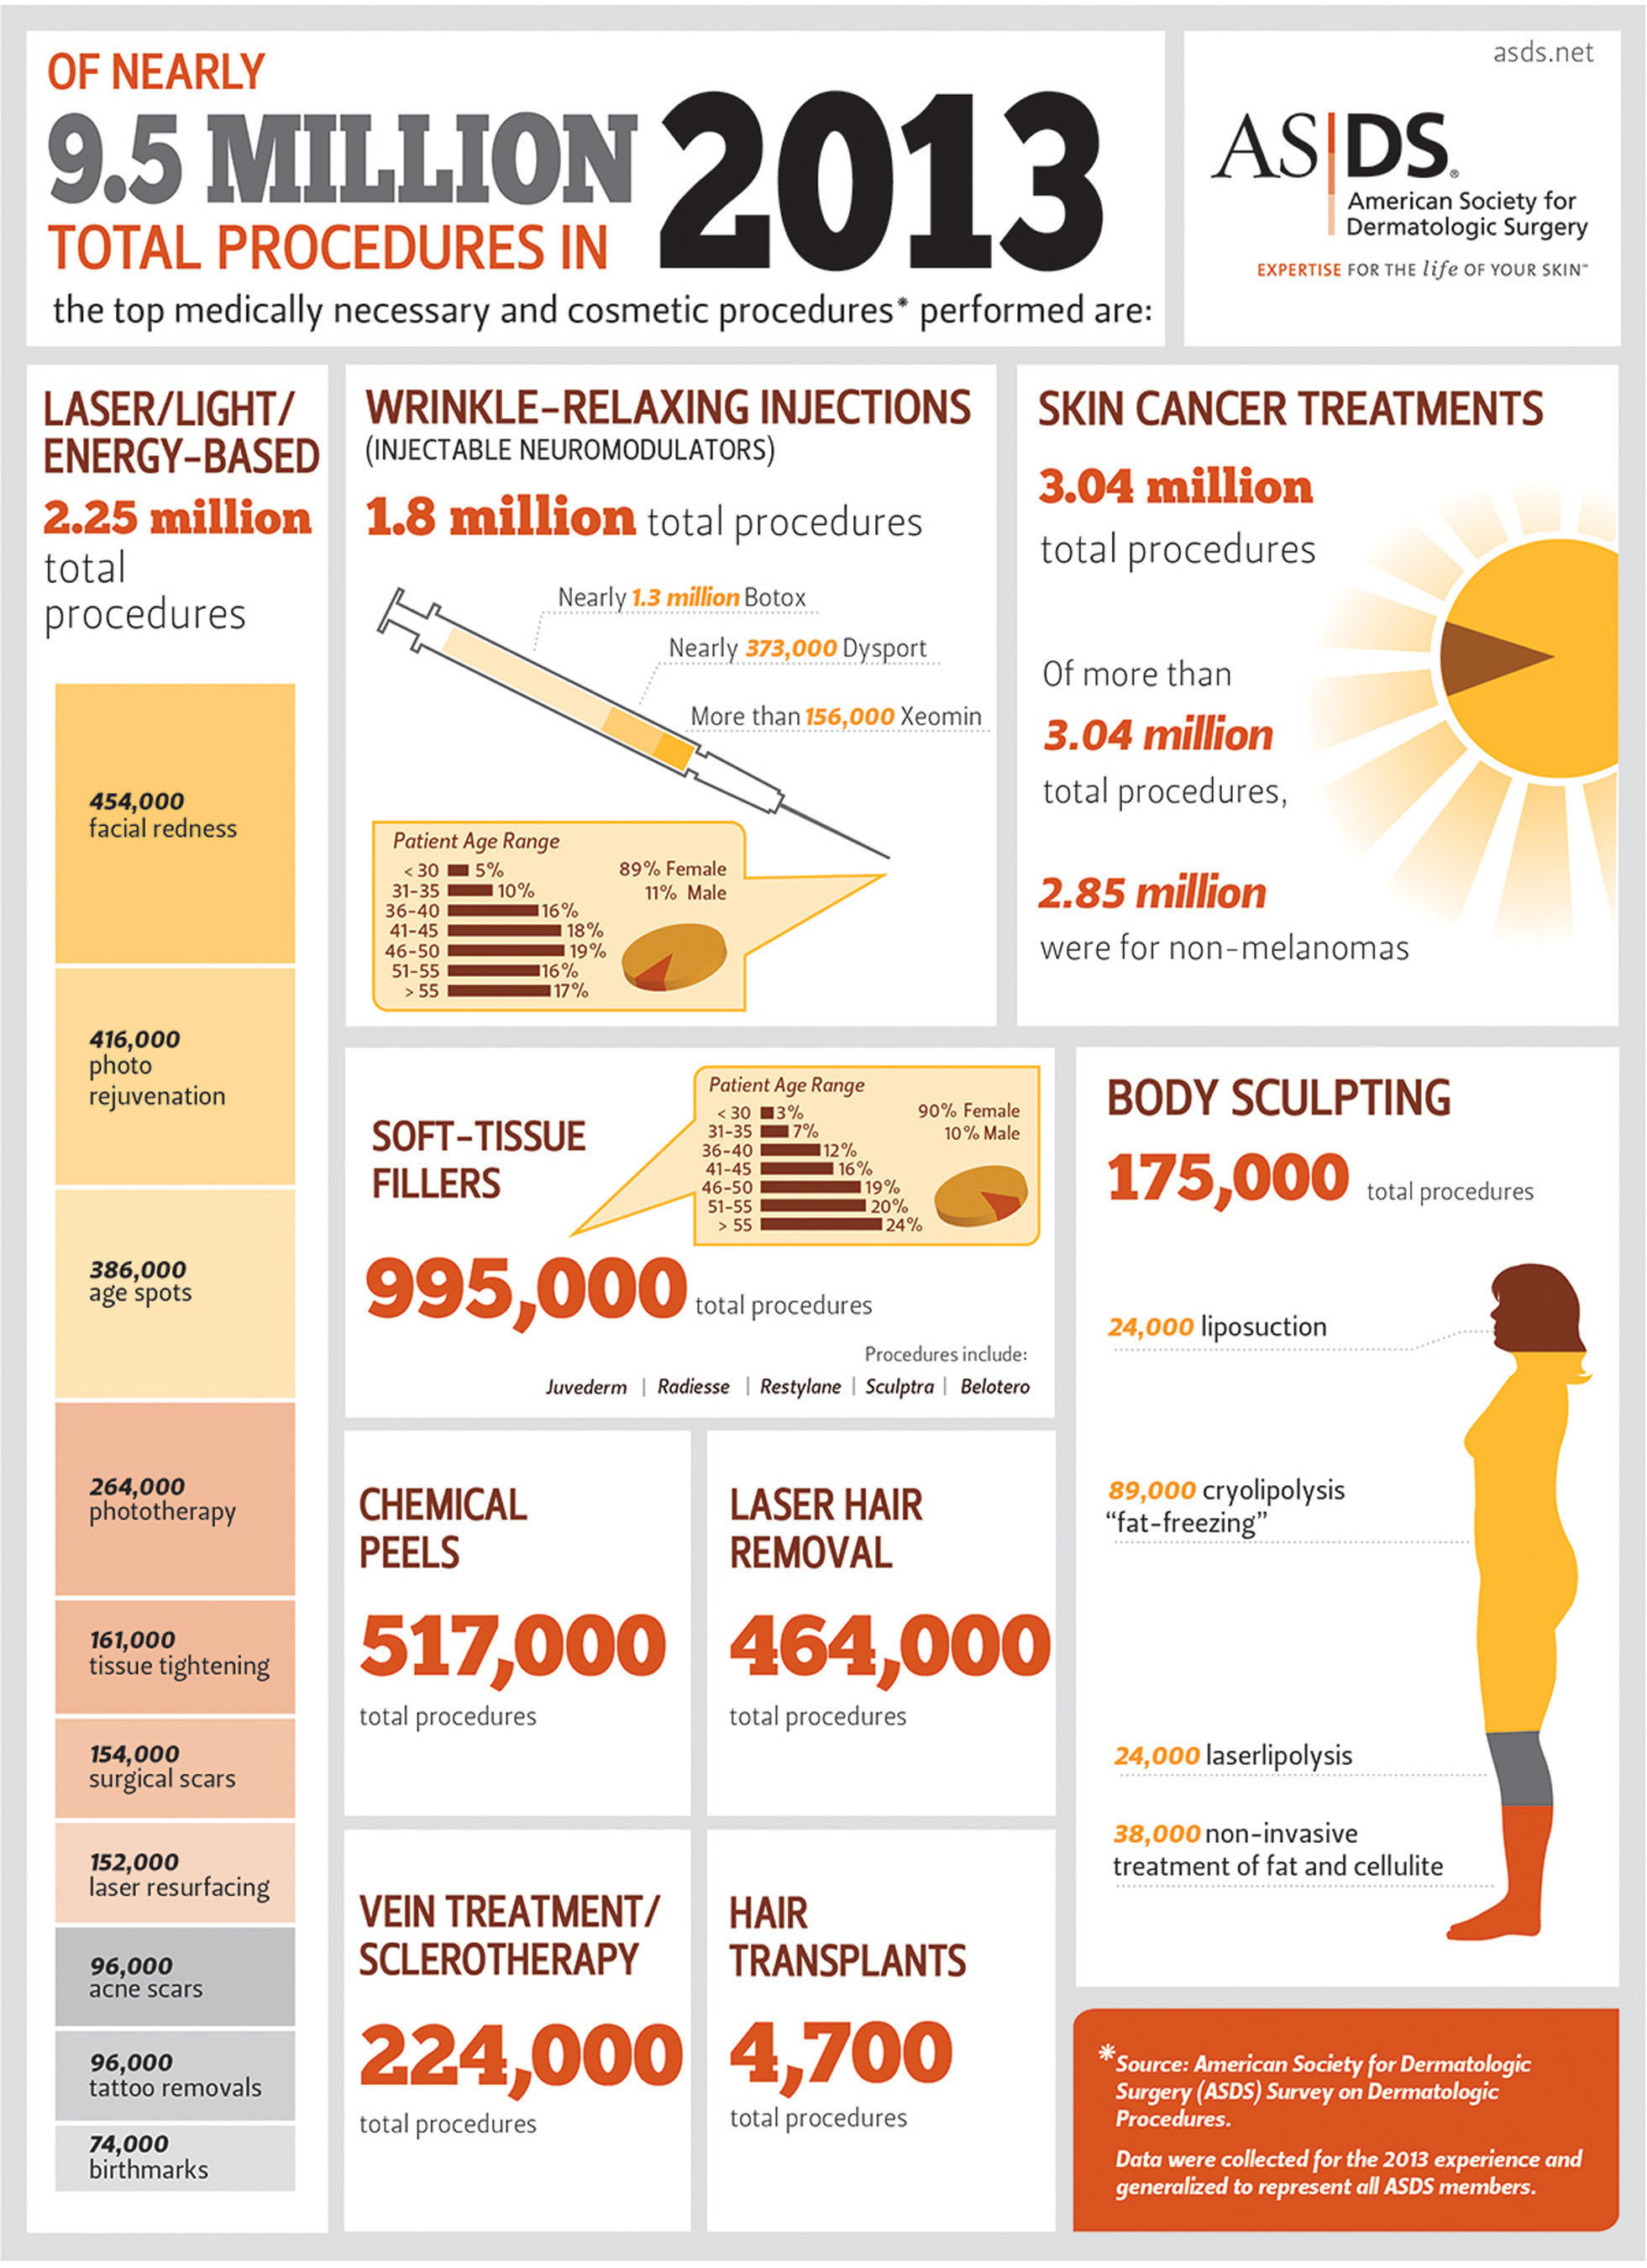 2013 ASDS Survey on Dermatologic Procedures.  (PRNewsFoto/American Society for Dermatologic Surgery)